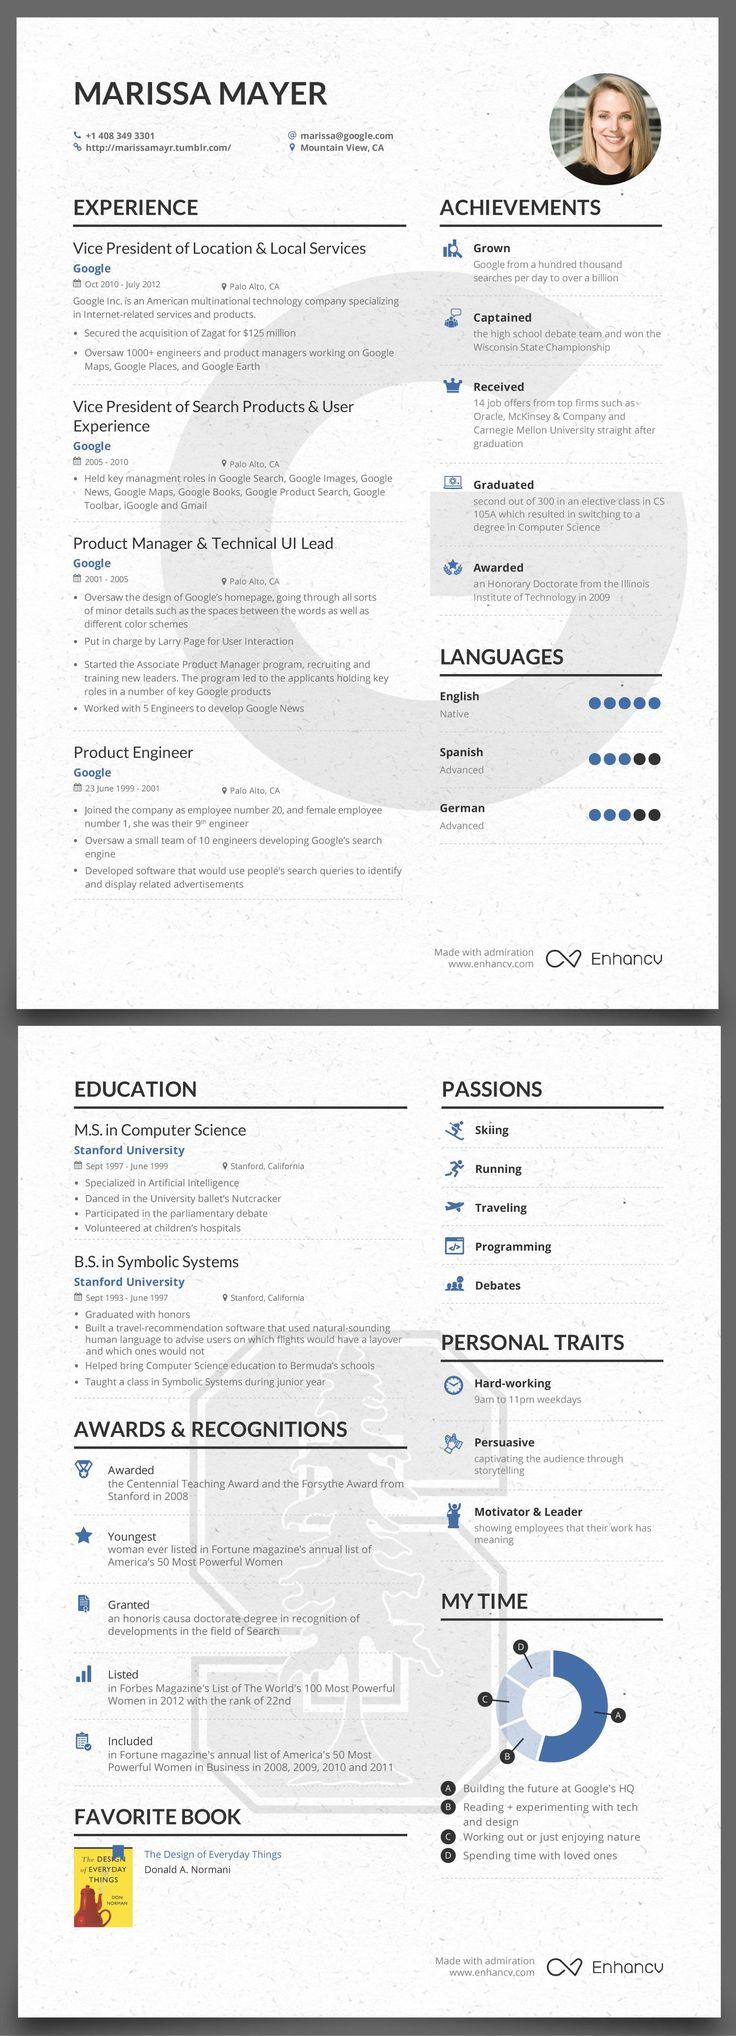 The Success Journey: Marissa Mayer's Pre-Yahoo Resume